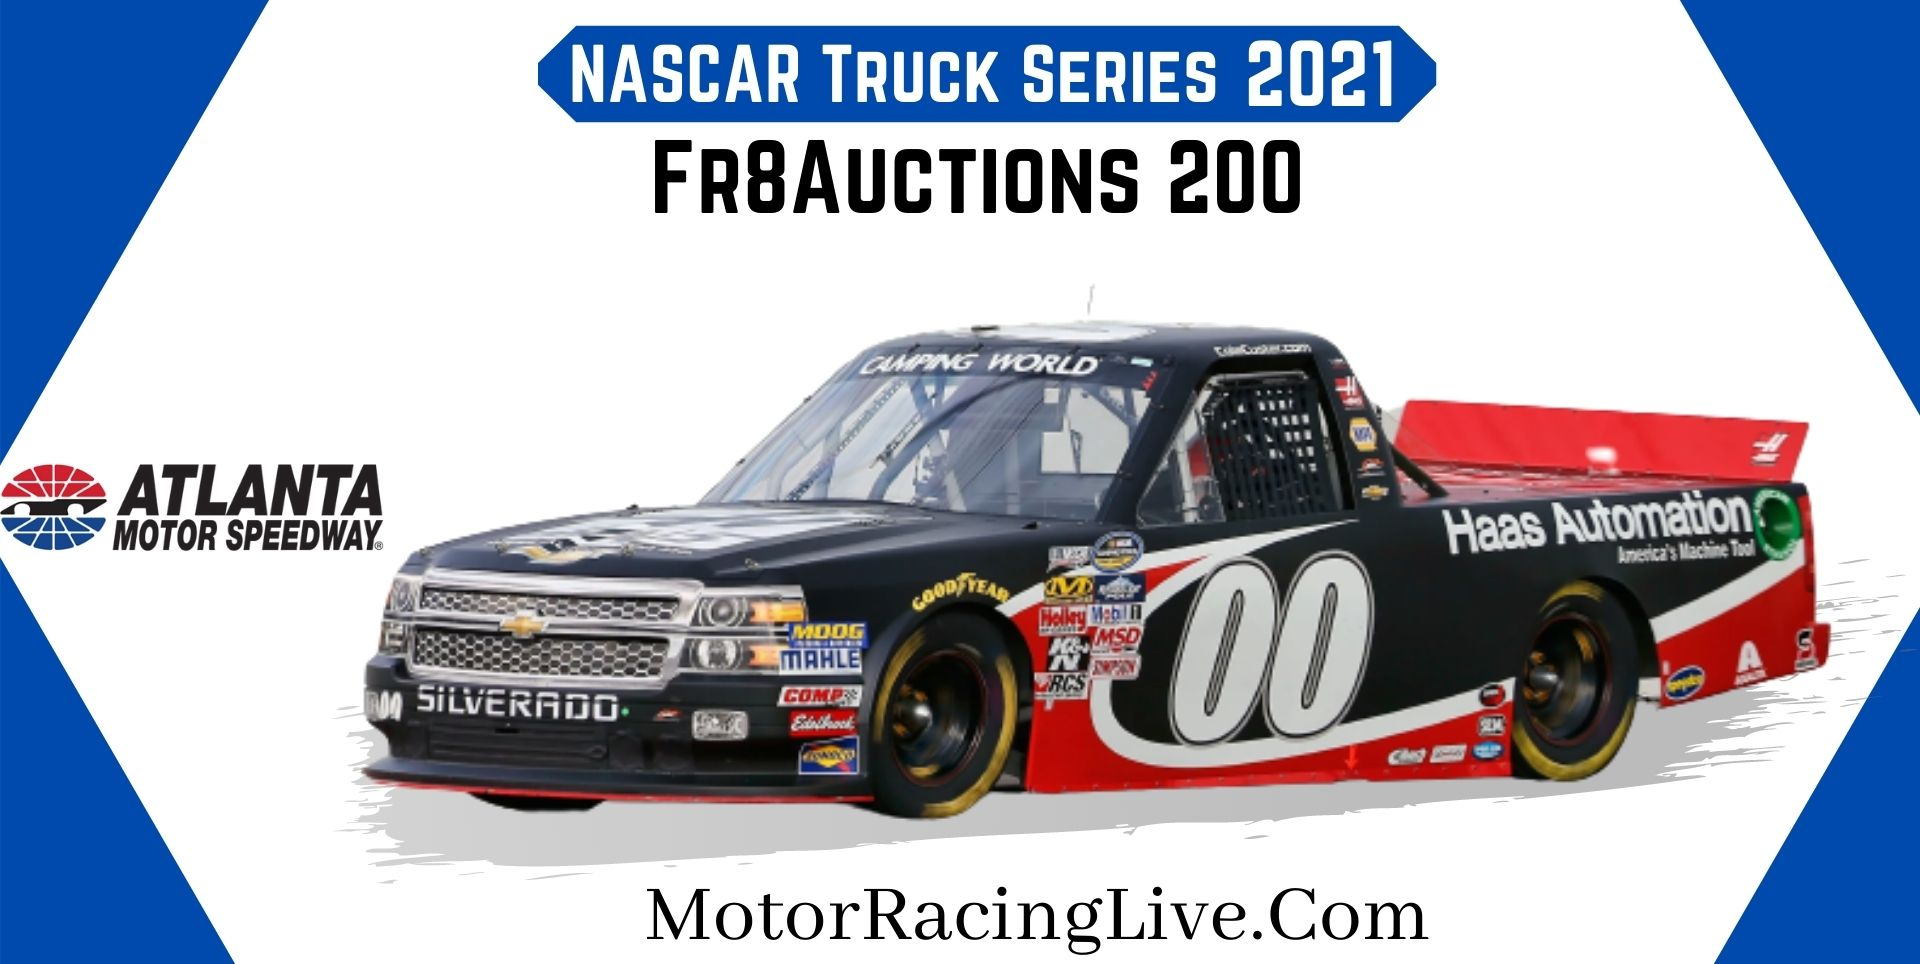 Fr8Auctions 200 Nascar Truck 2021 Live Stream